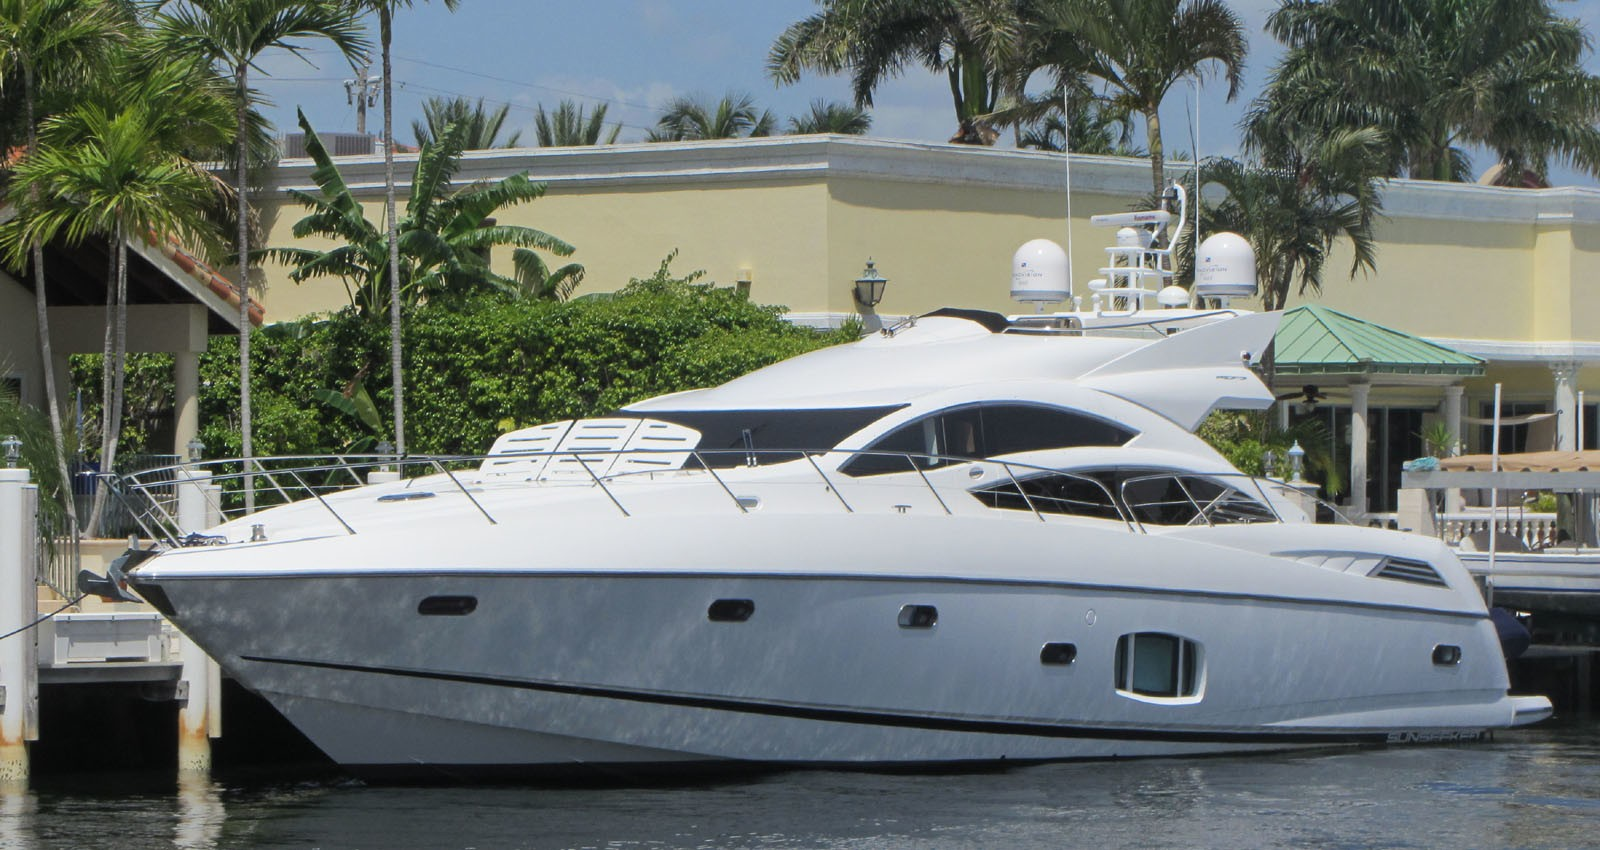 The 22m Yacht EAGLE II